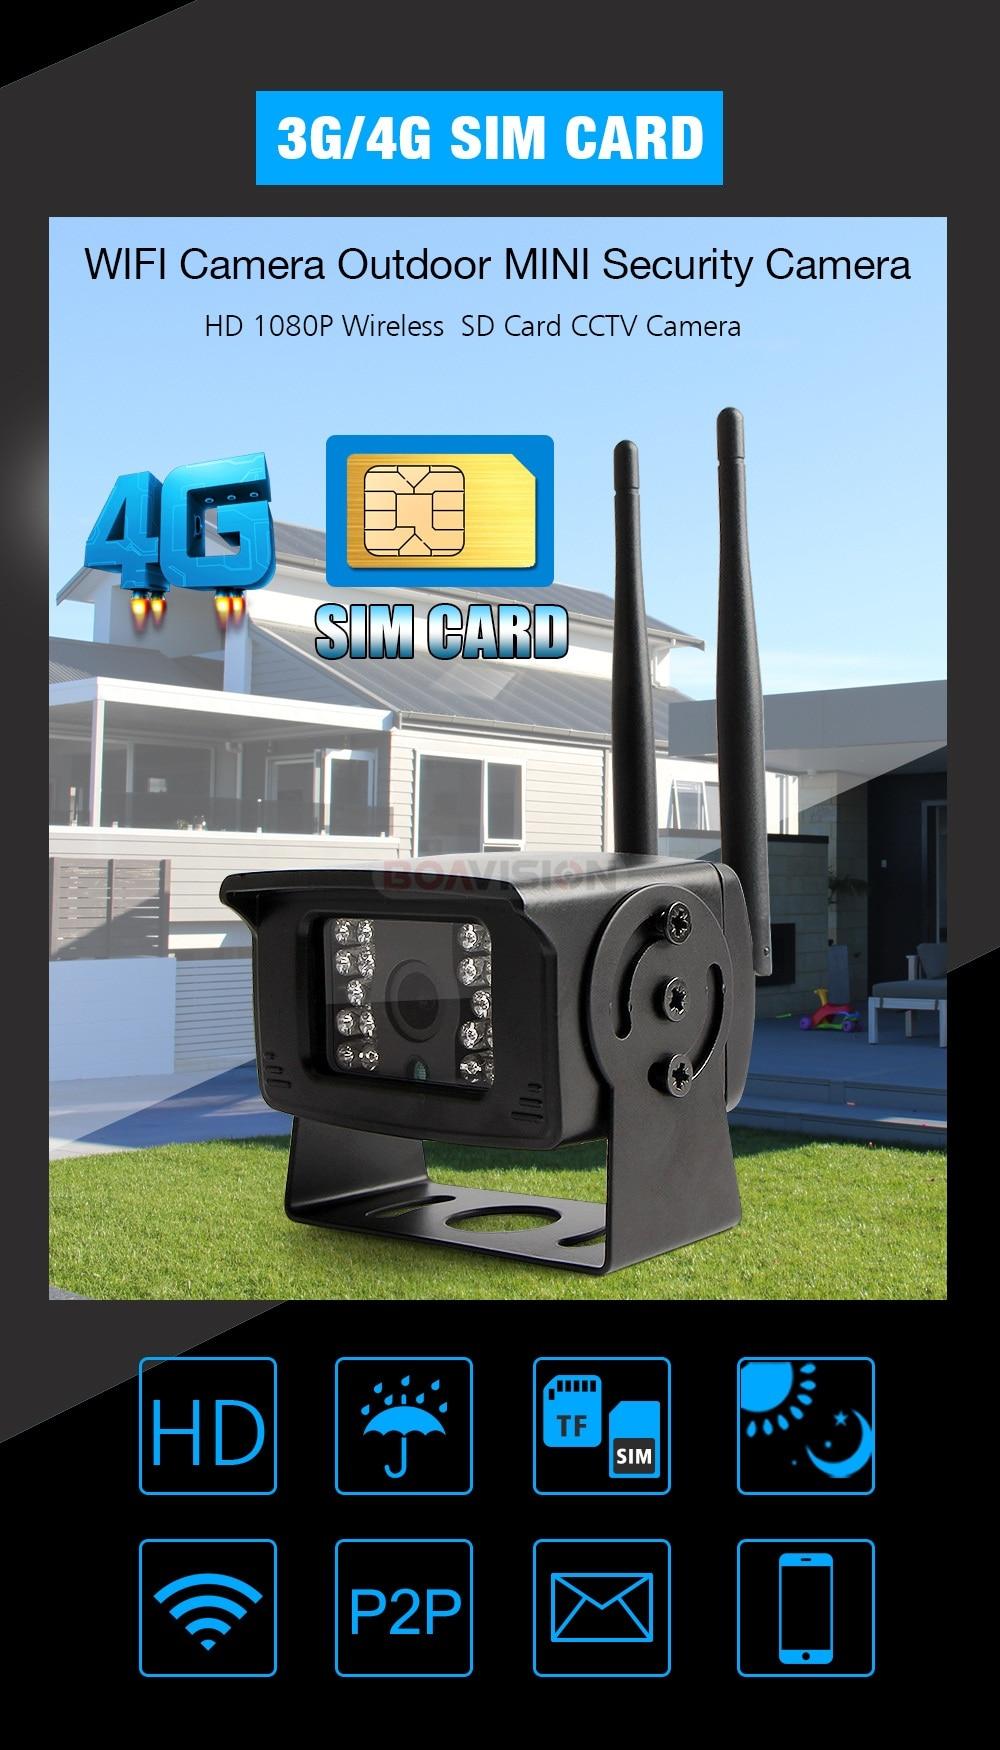 4G-WIFI--NC96G_01